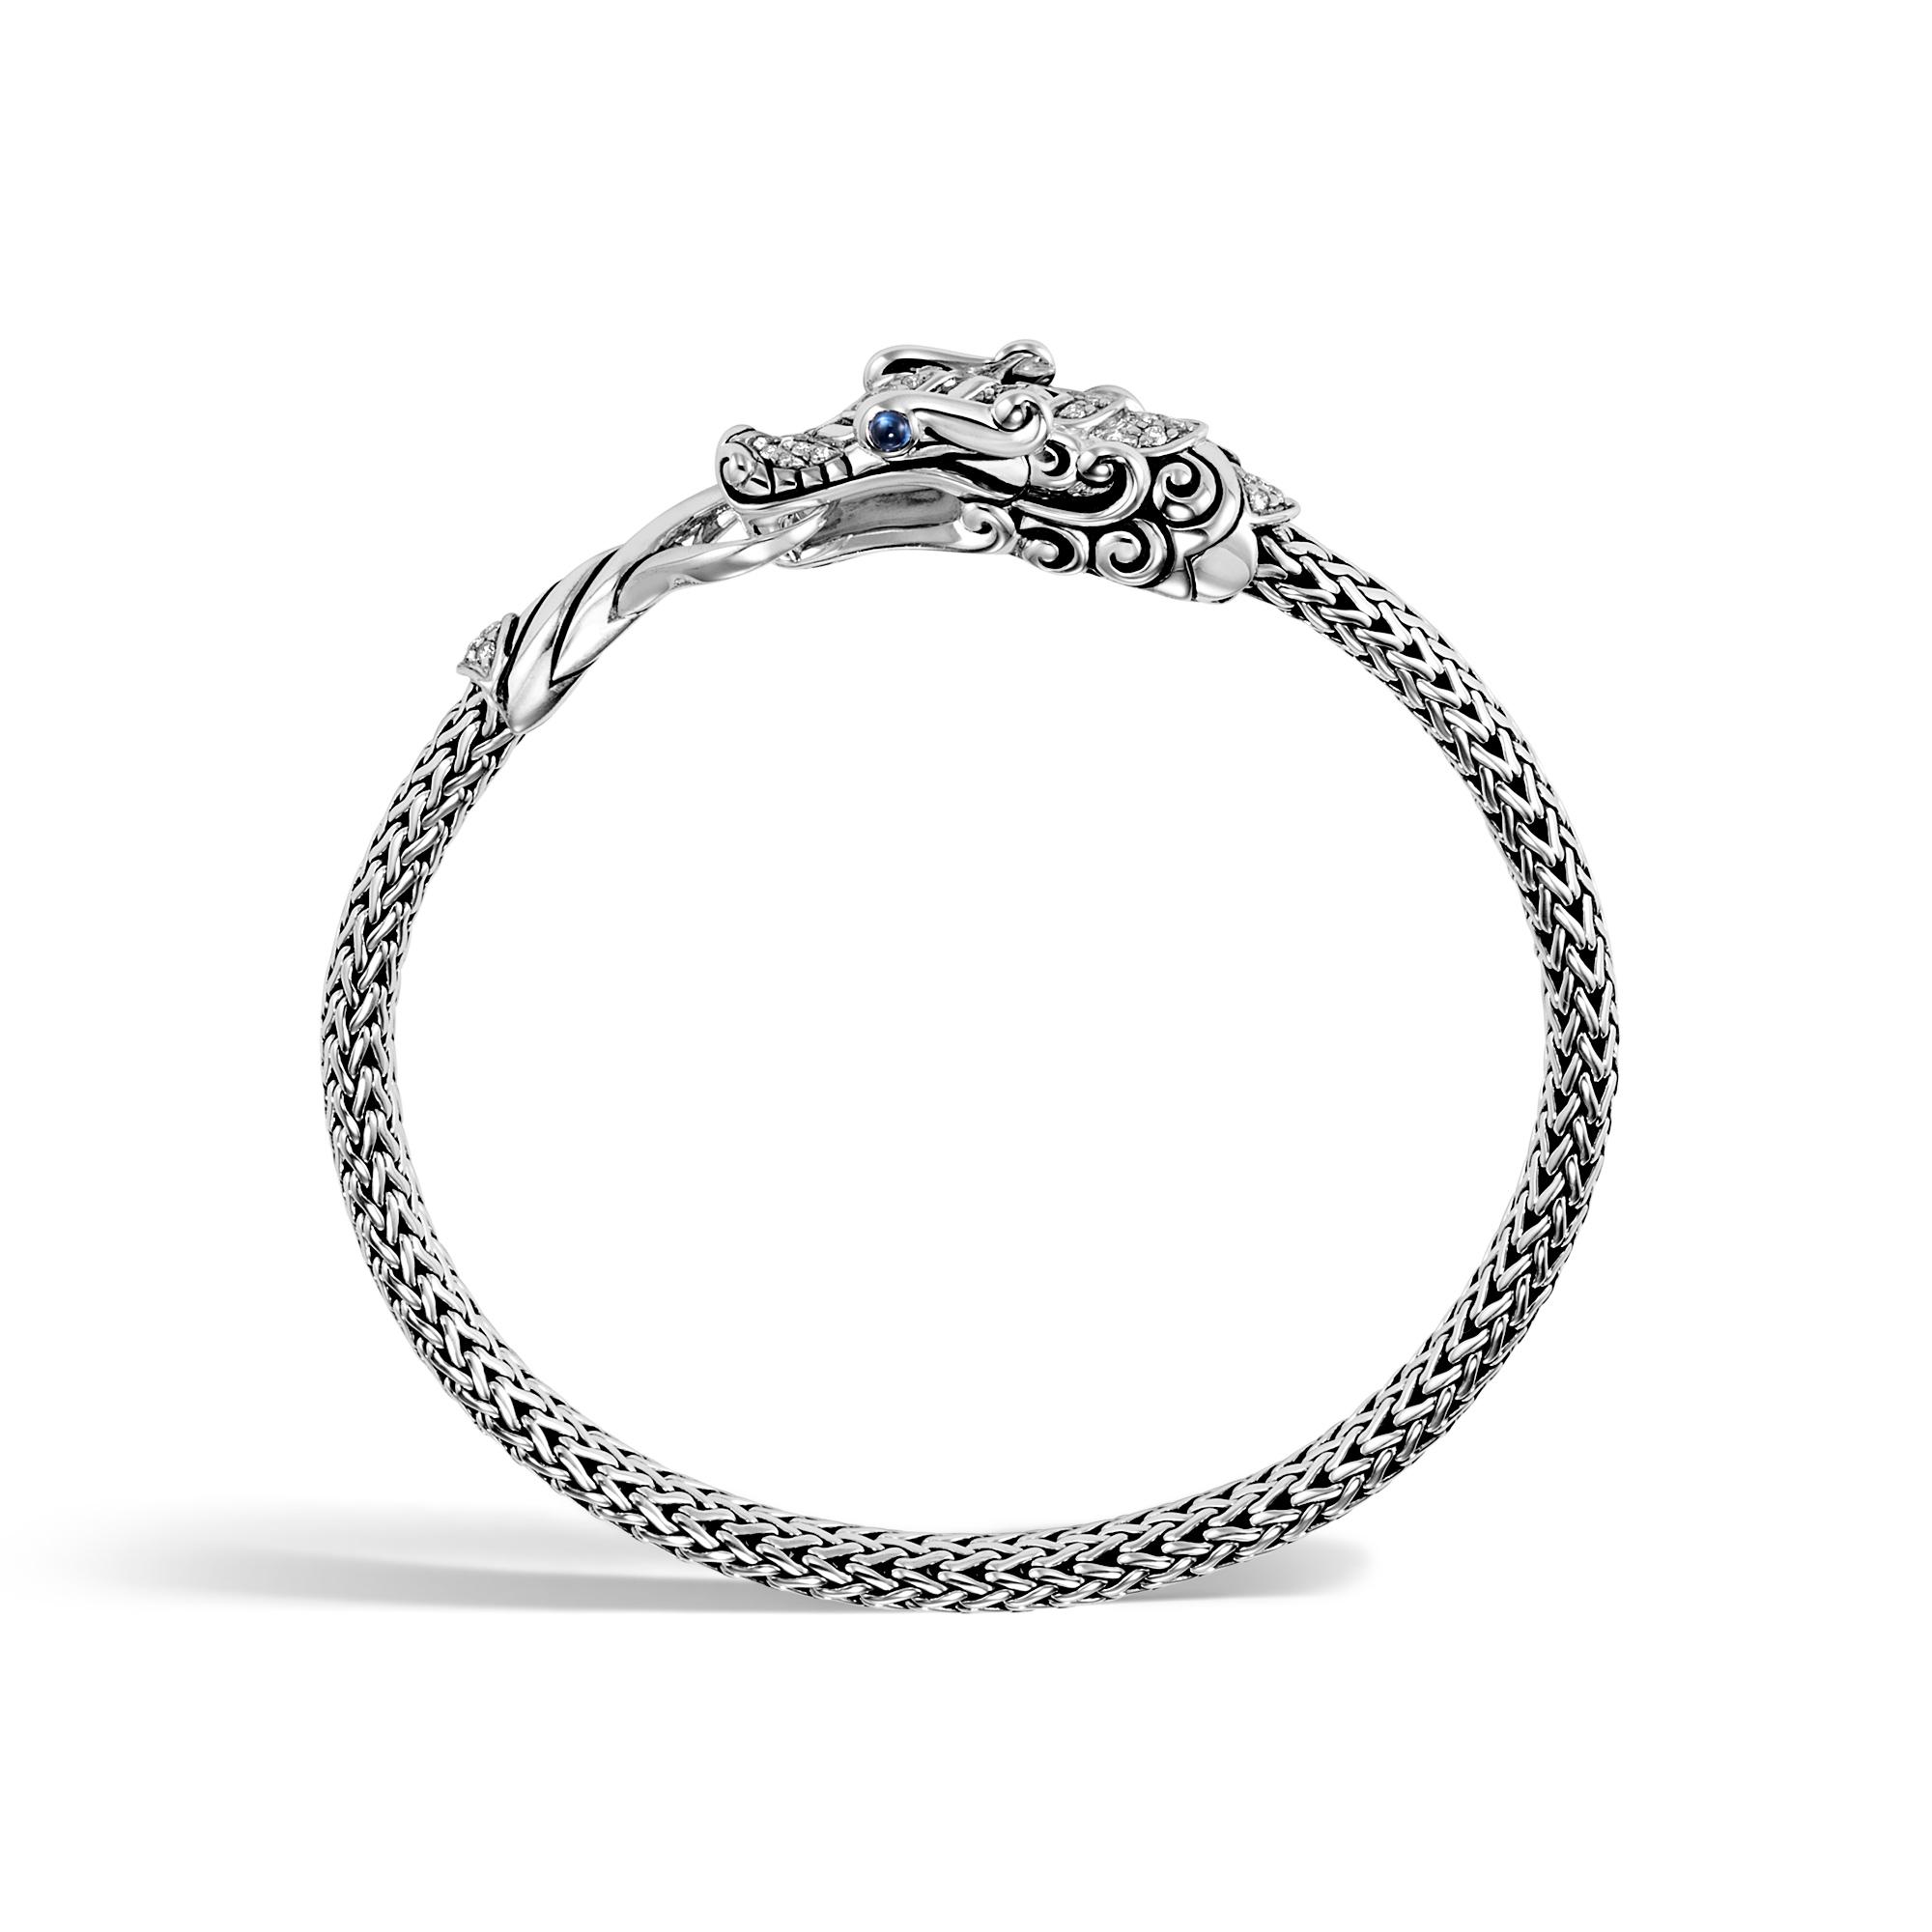 Legends Naga 5MM Station Bracelet in Silver with Diamond, White Diamond, large